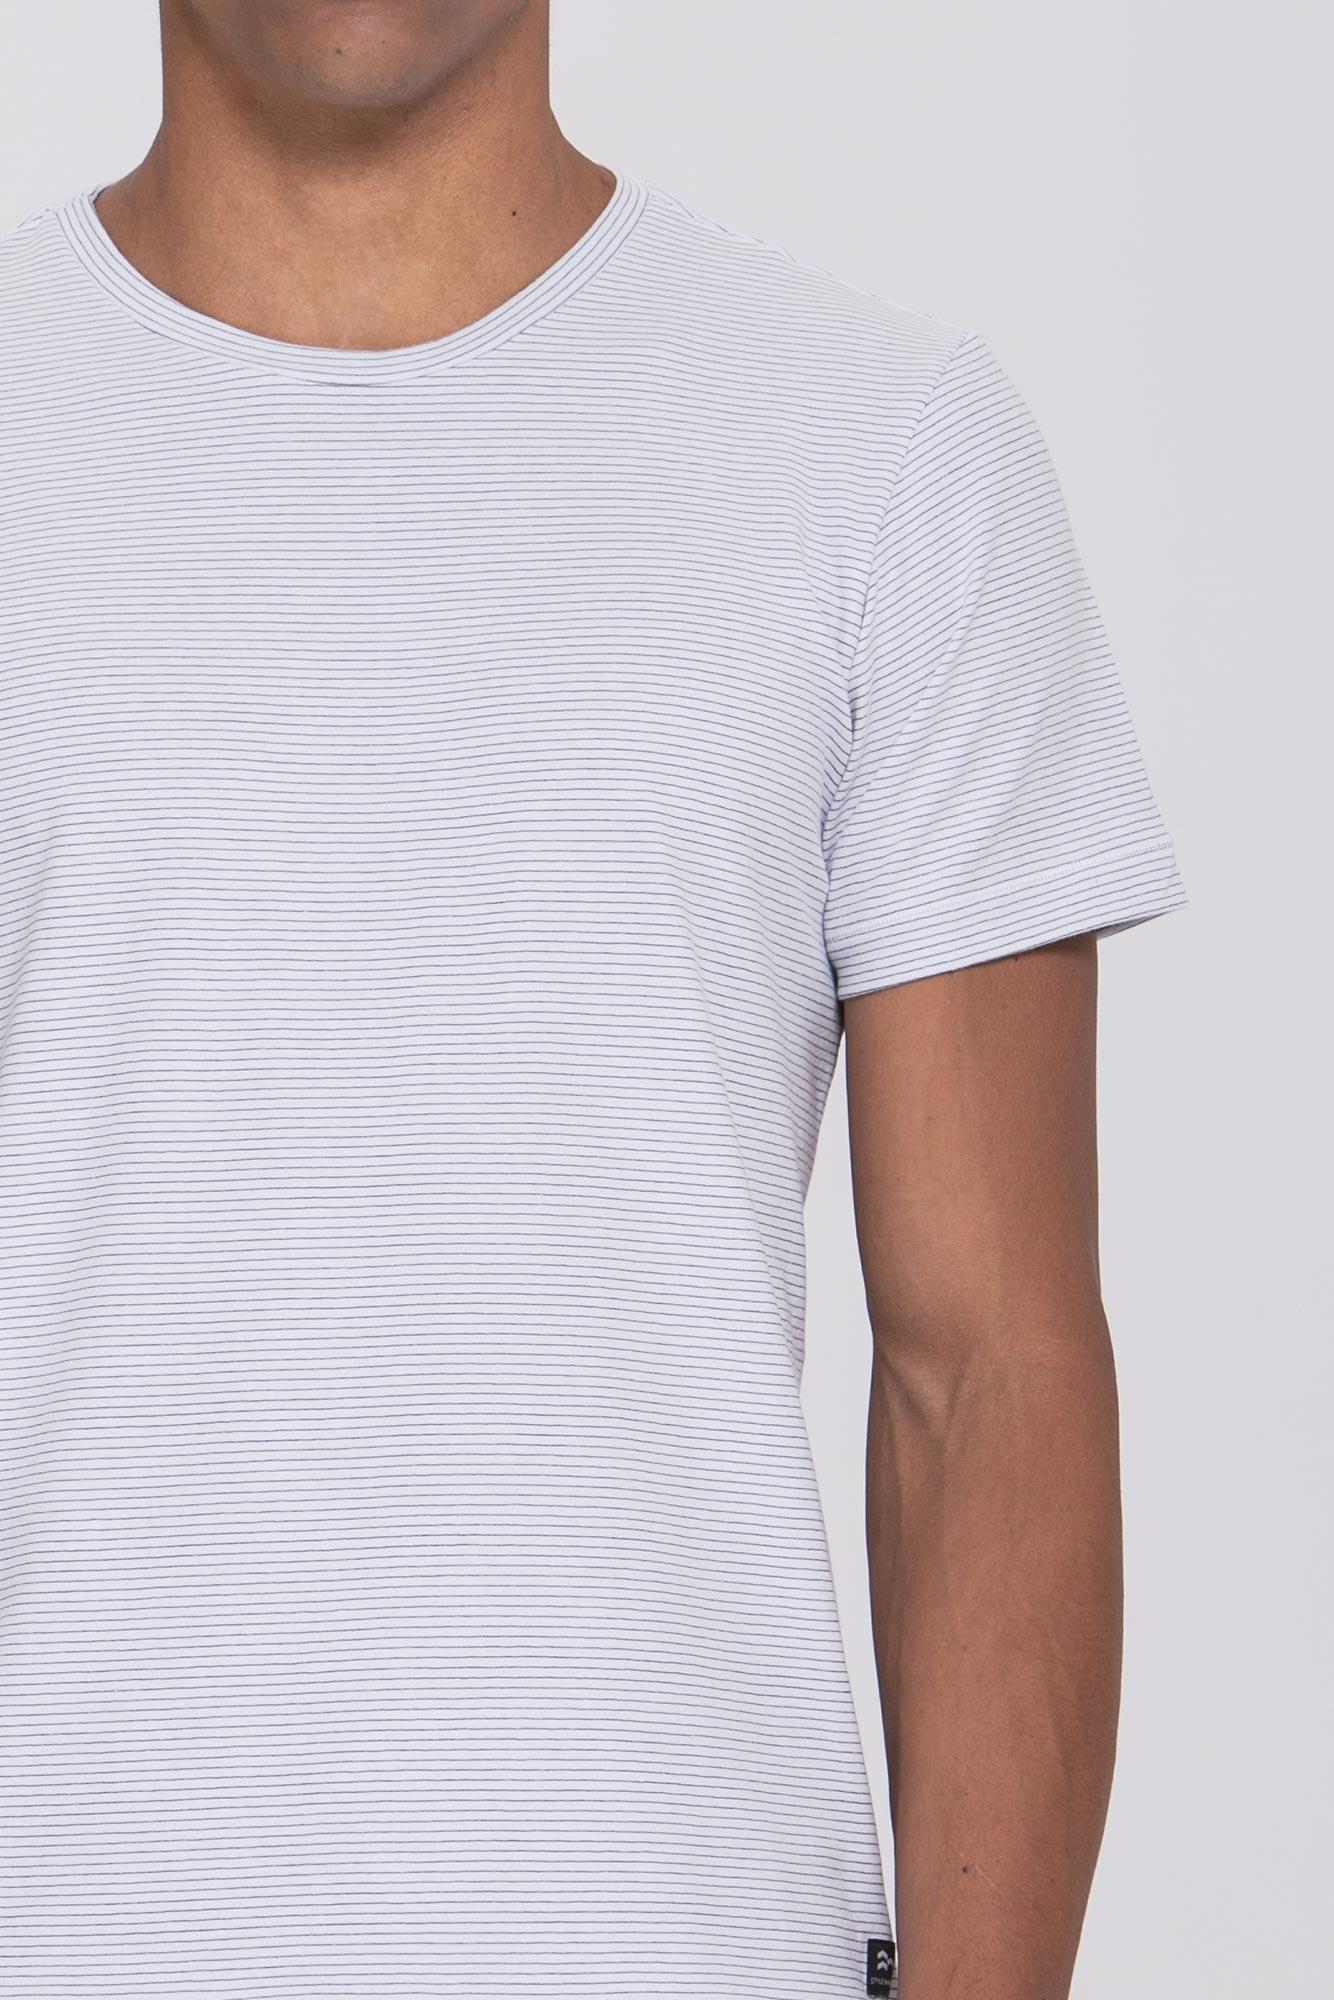 Camiseta Hype Mini Branca